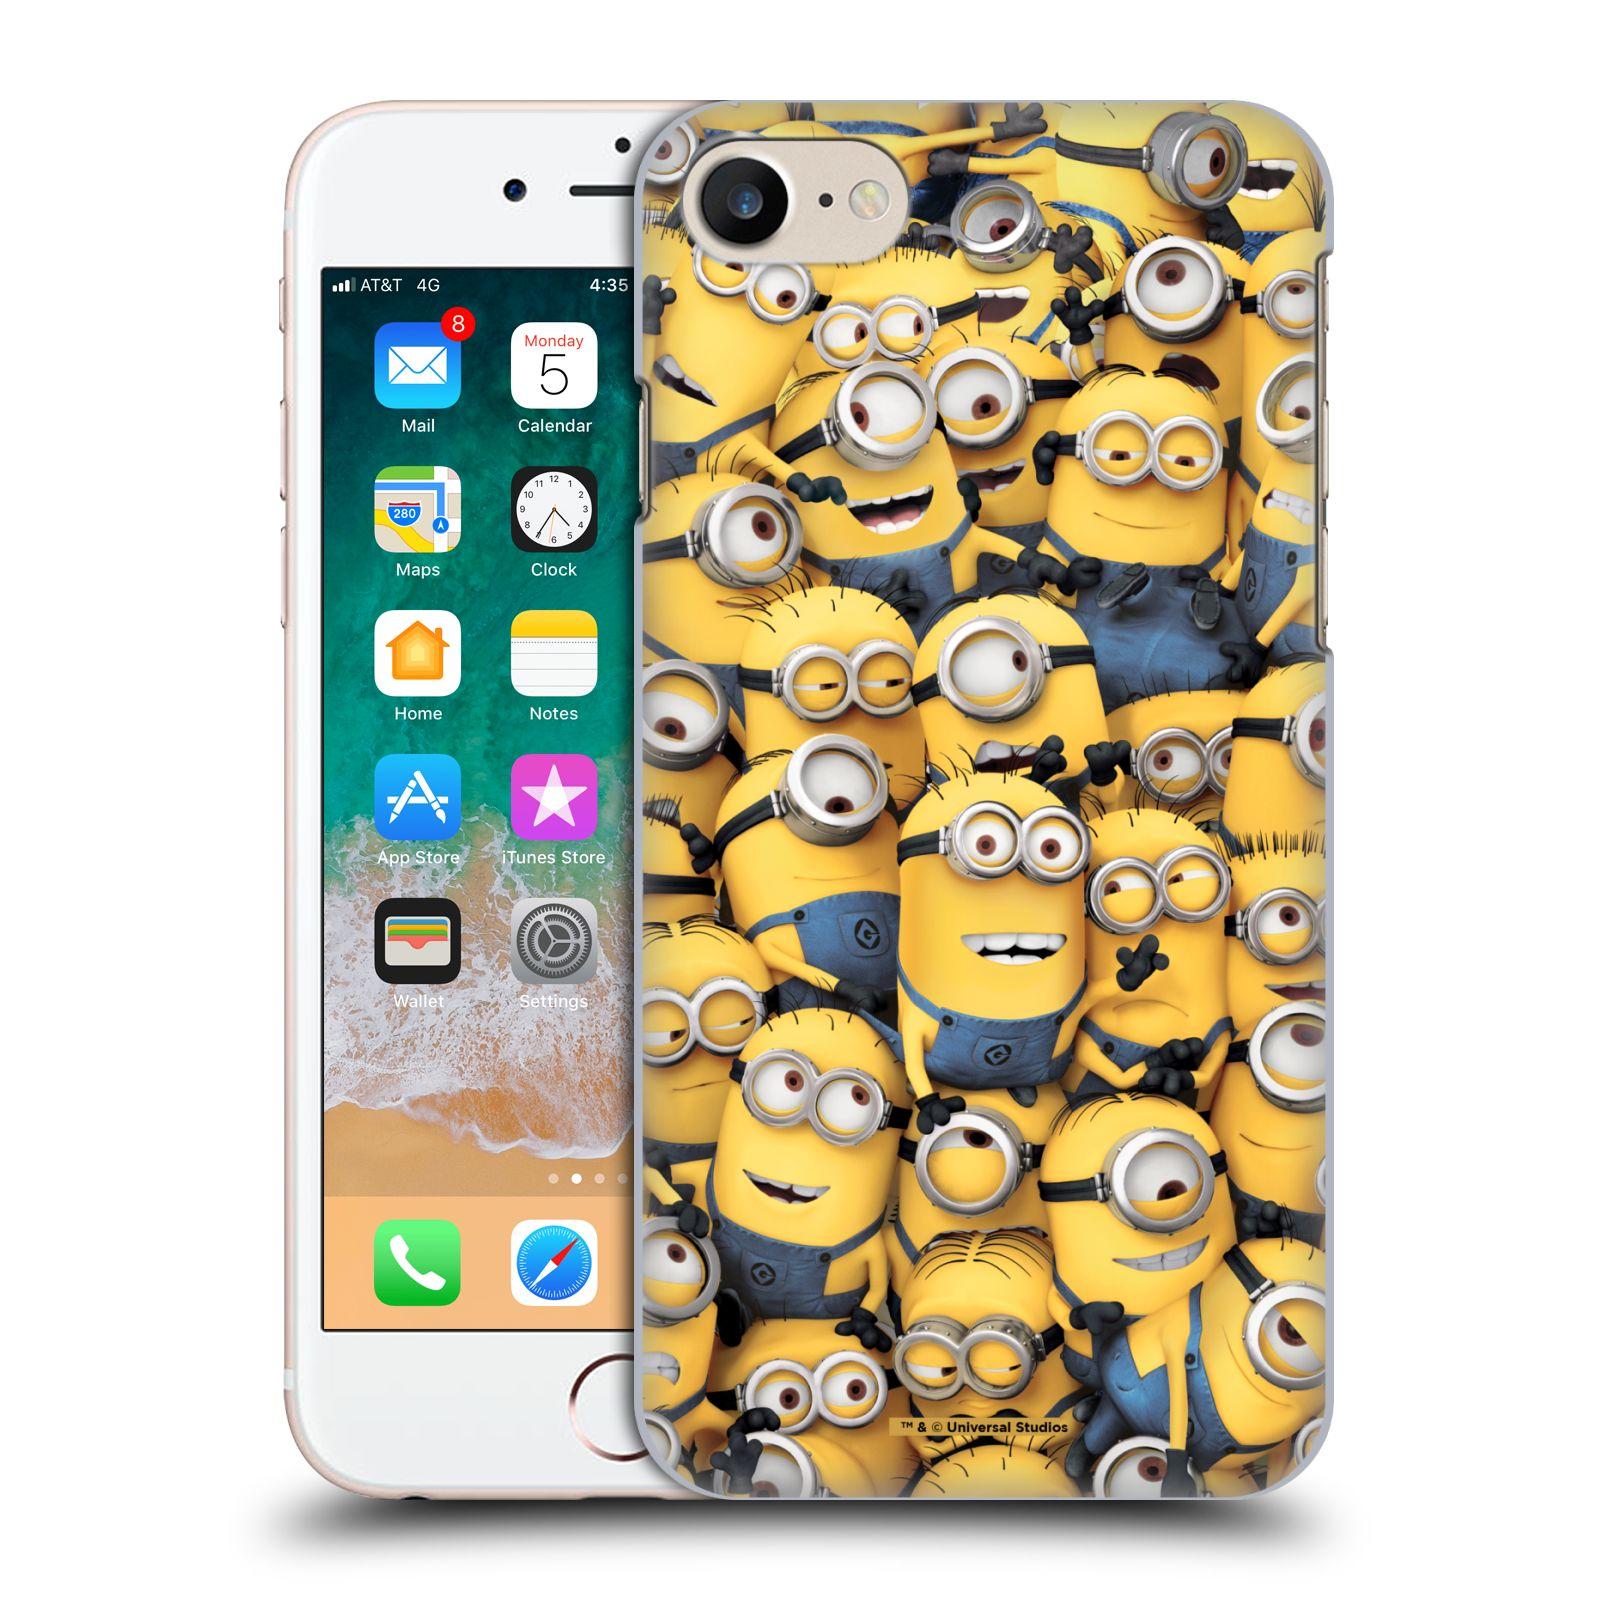 Plastové pouzdro na mobil Apple iPhone SE (2020) - Head Case - Mimoni všude z filmu Já, padouch - Despicable Me